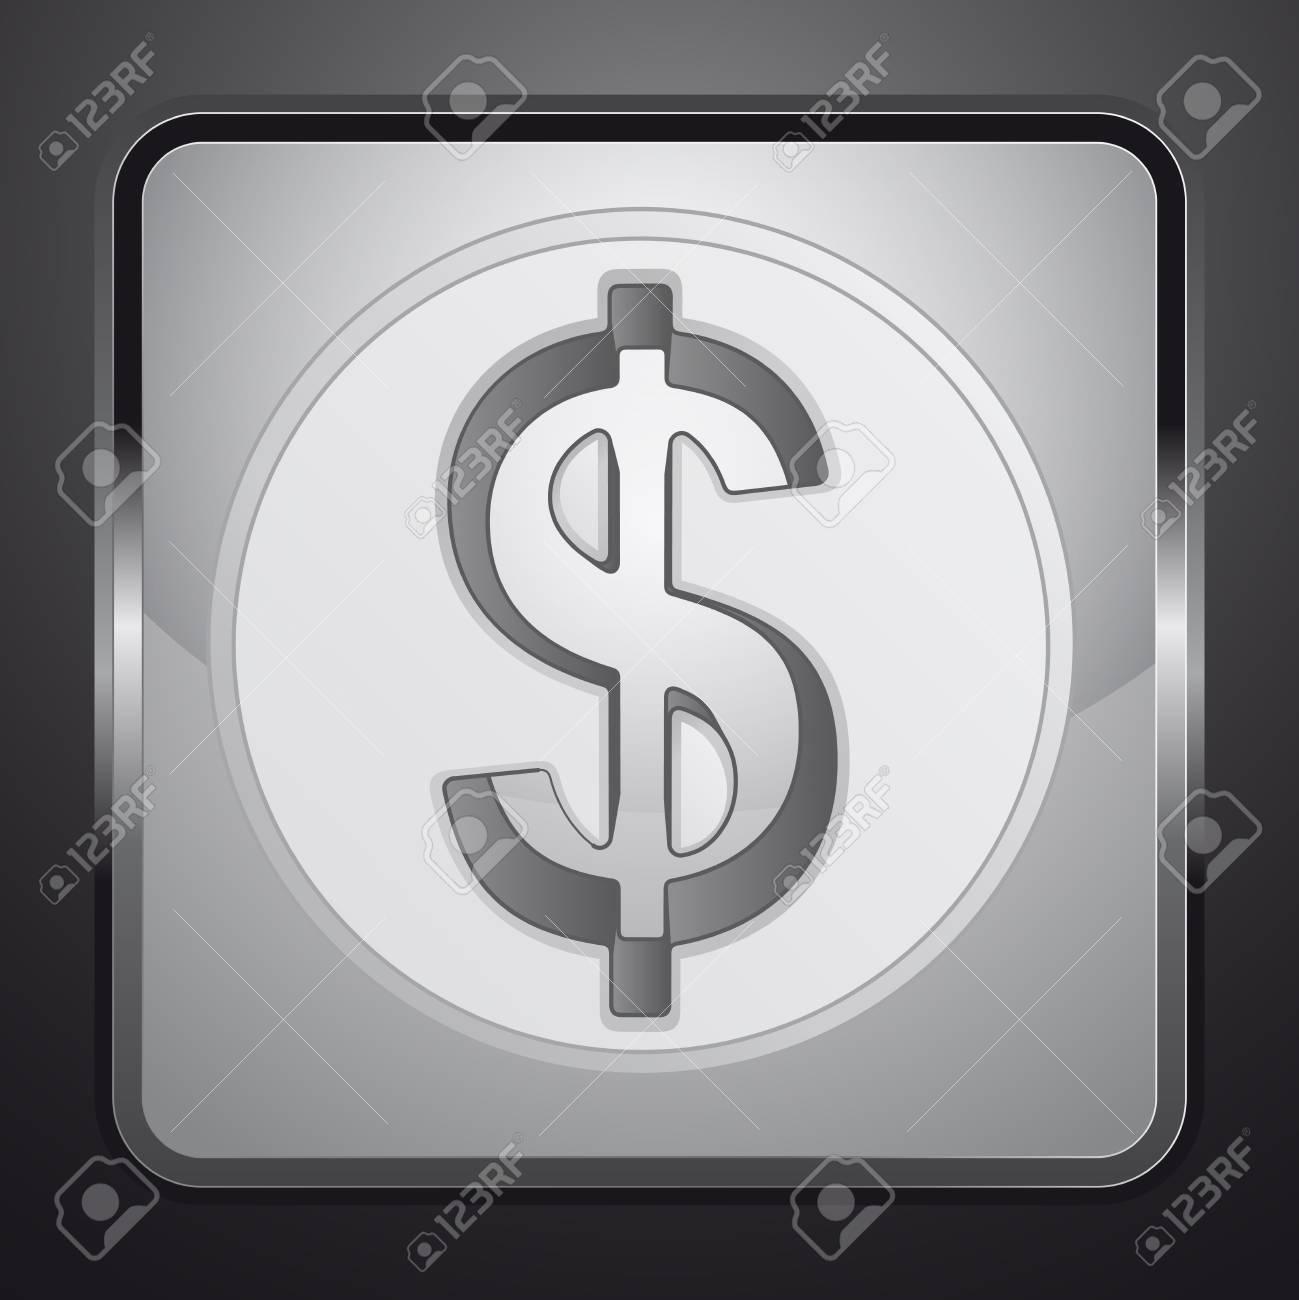 silver american dollar coin square button vector illustration Stock Vector - 21228887